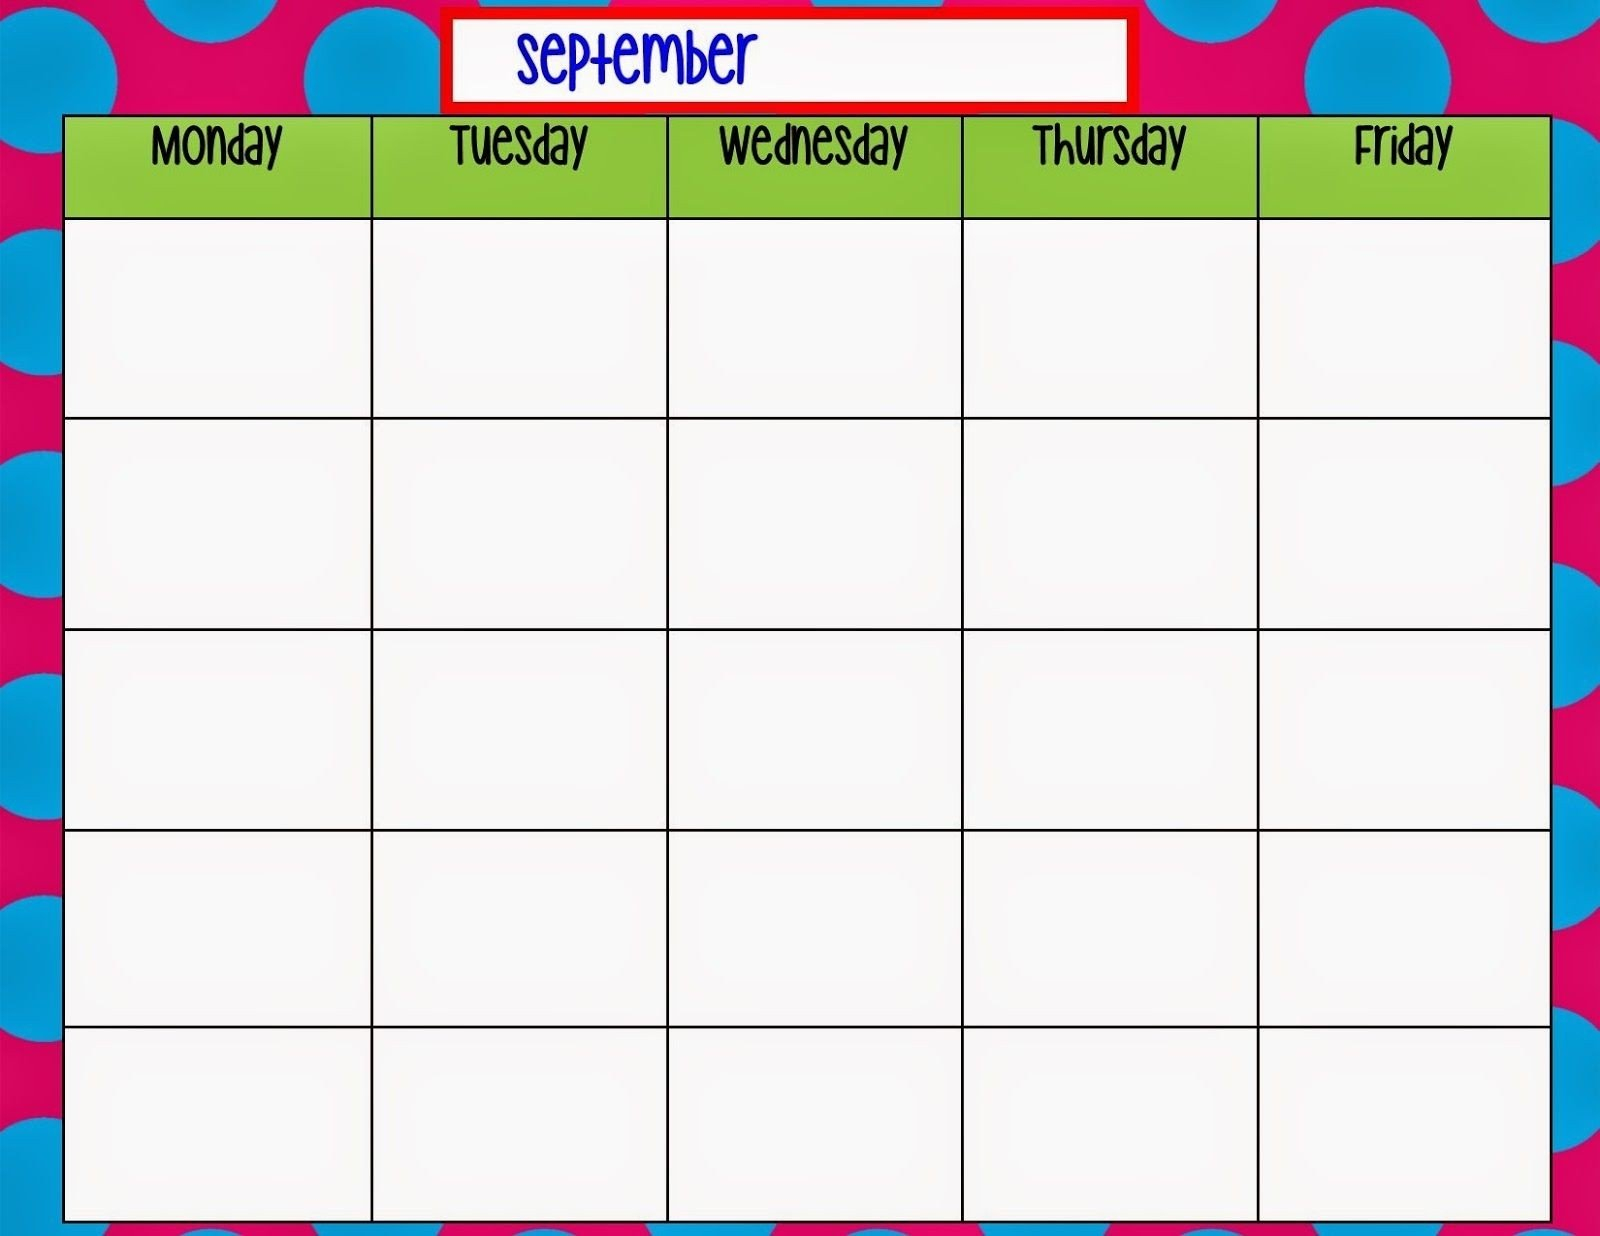 Blank Monday Through Friday Calendars   Calendar Template Monday Thru Friday Printable Calendar Free